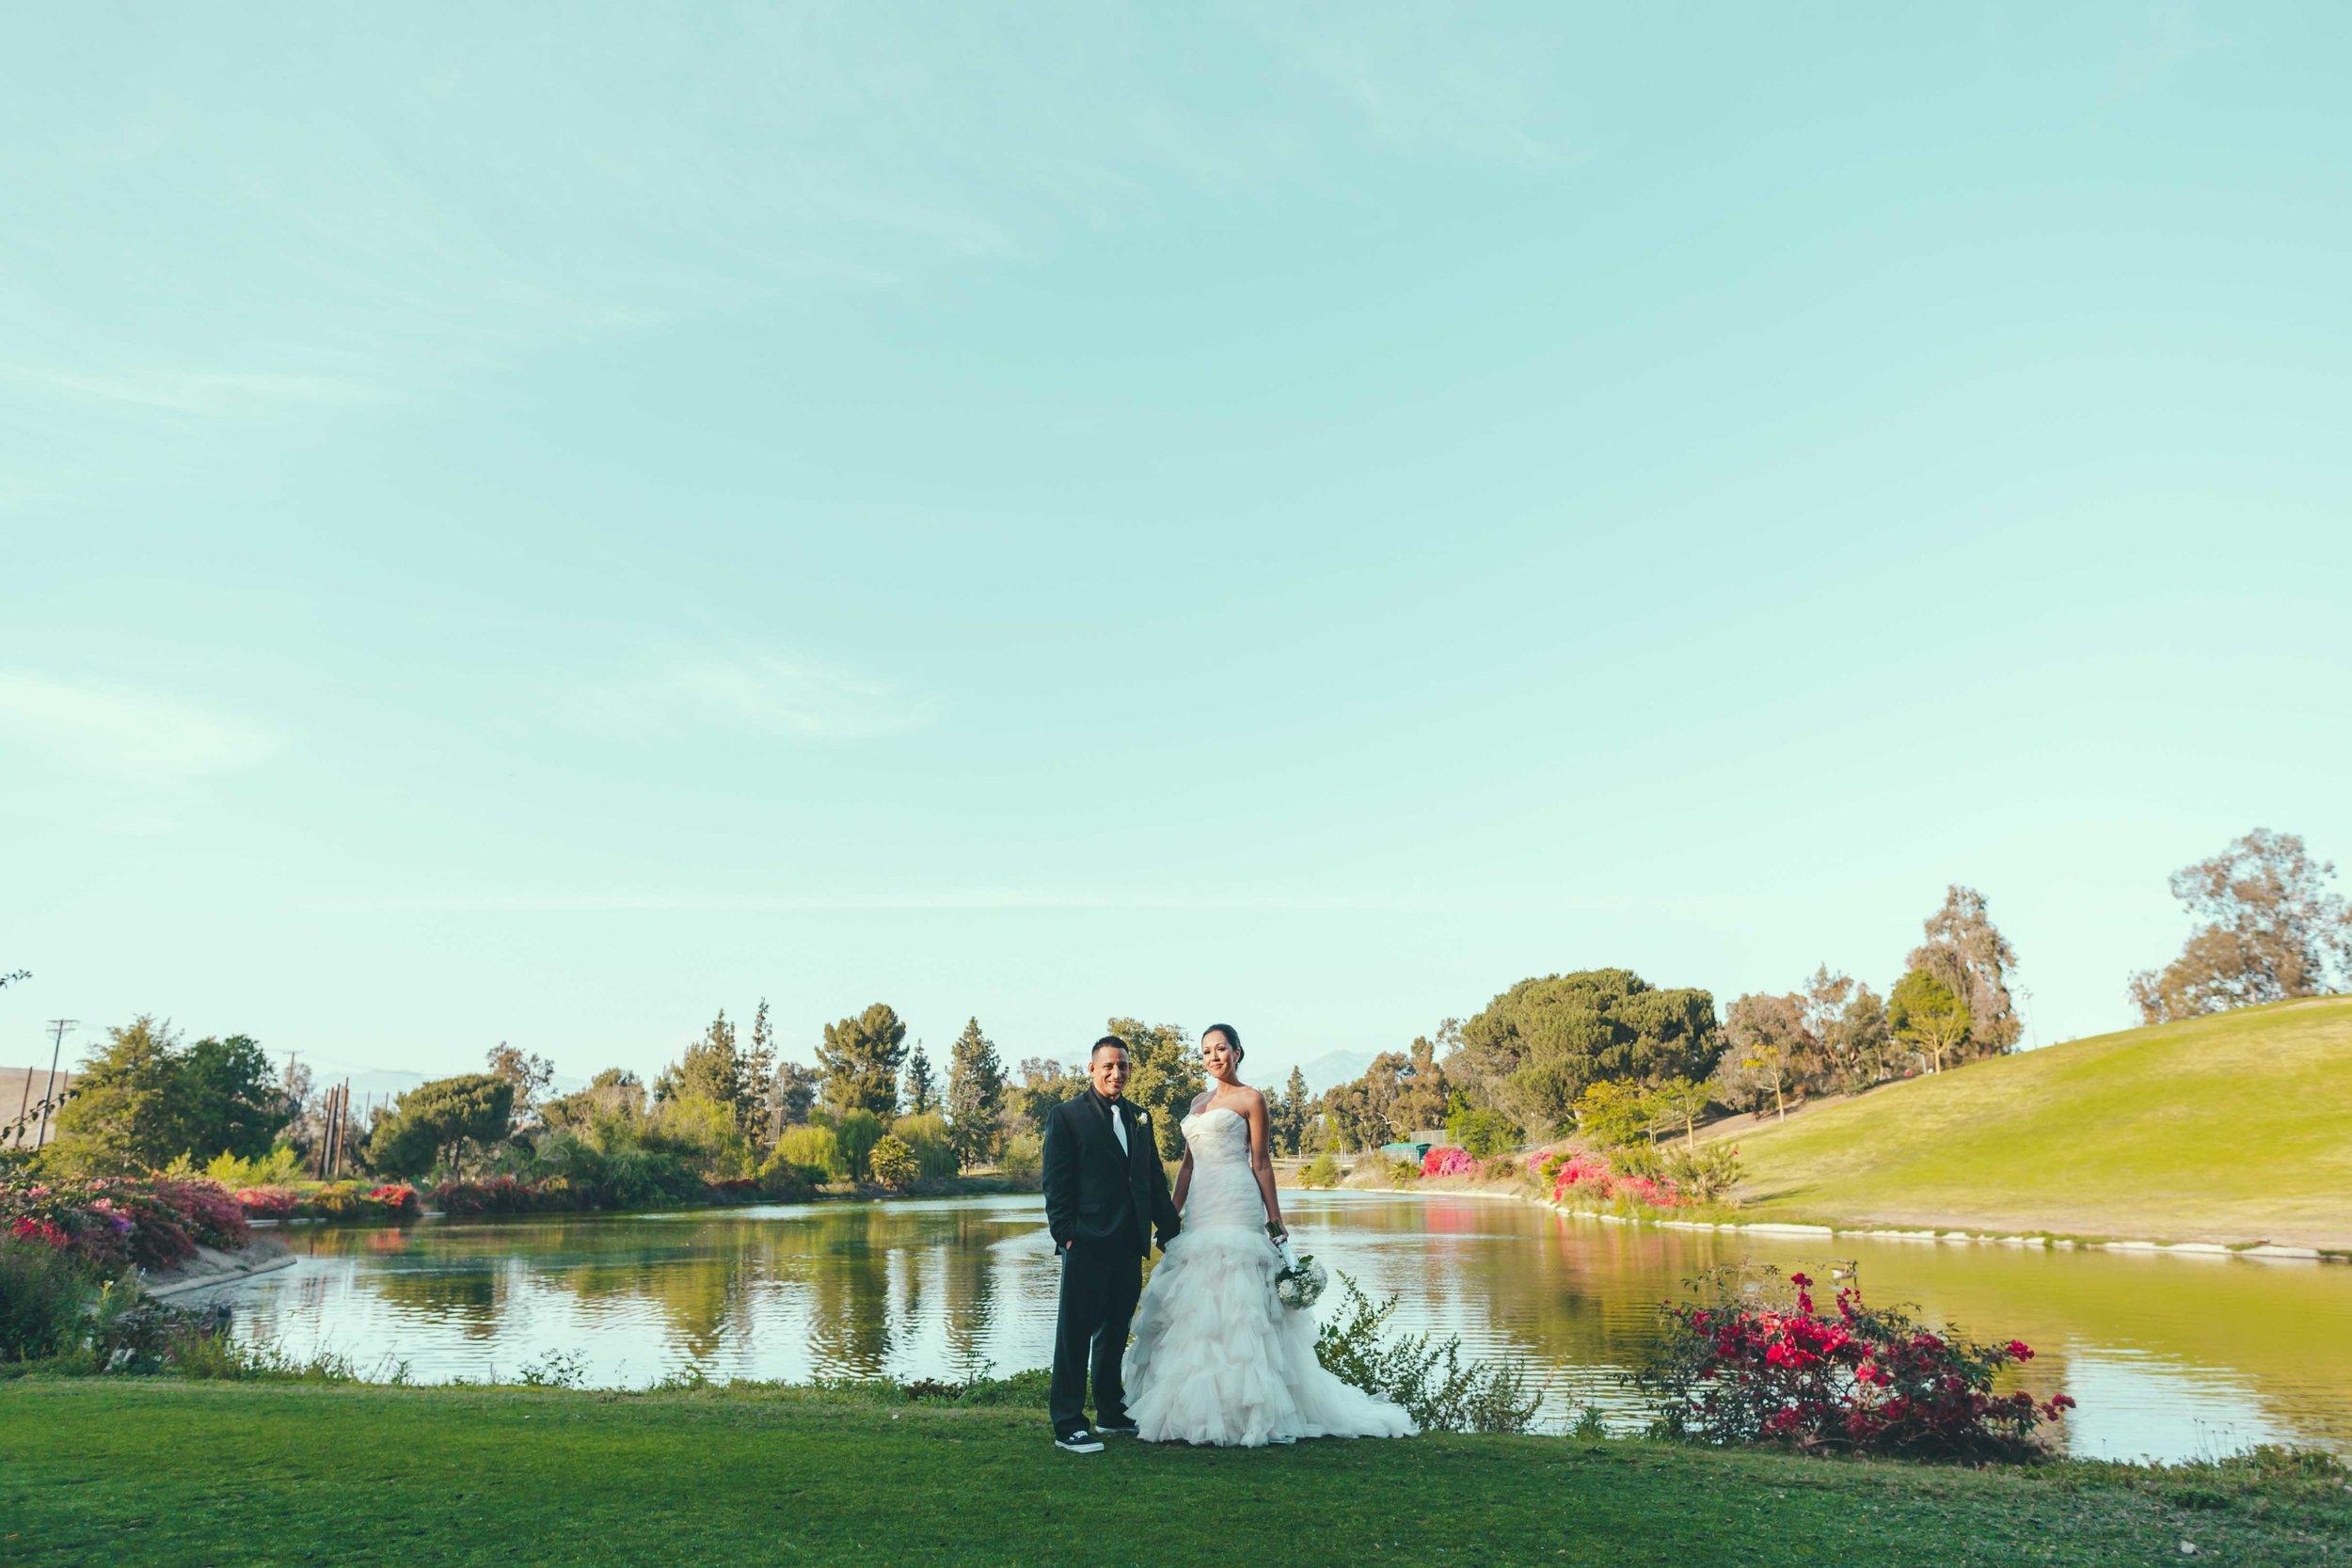 APavone-Photographer-Orange-County-Diamond-Bar-Wedding-064.jpg